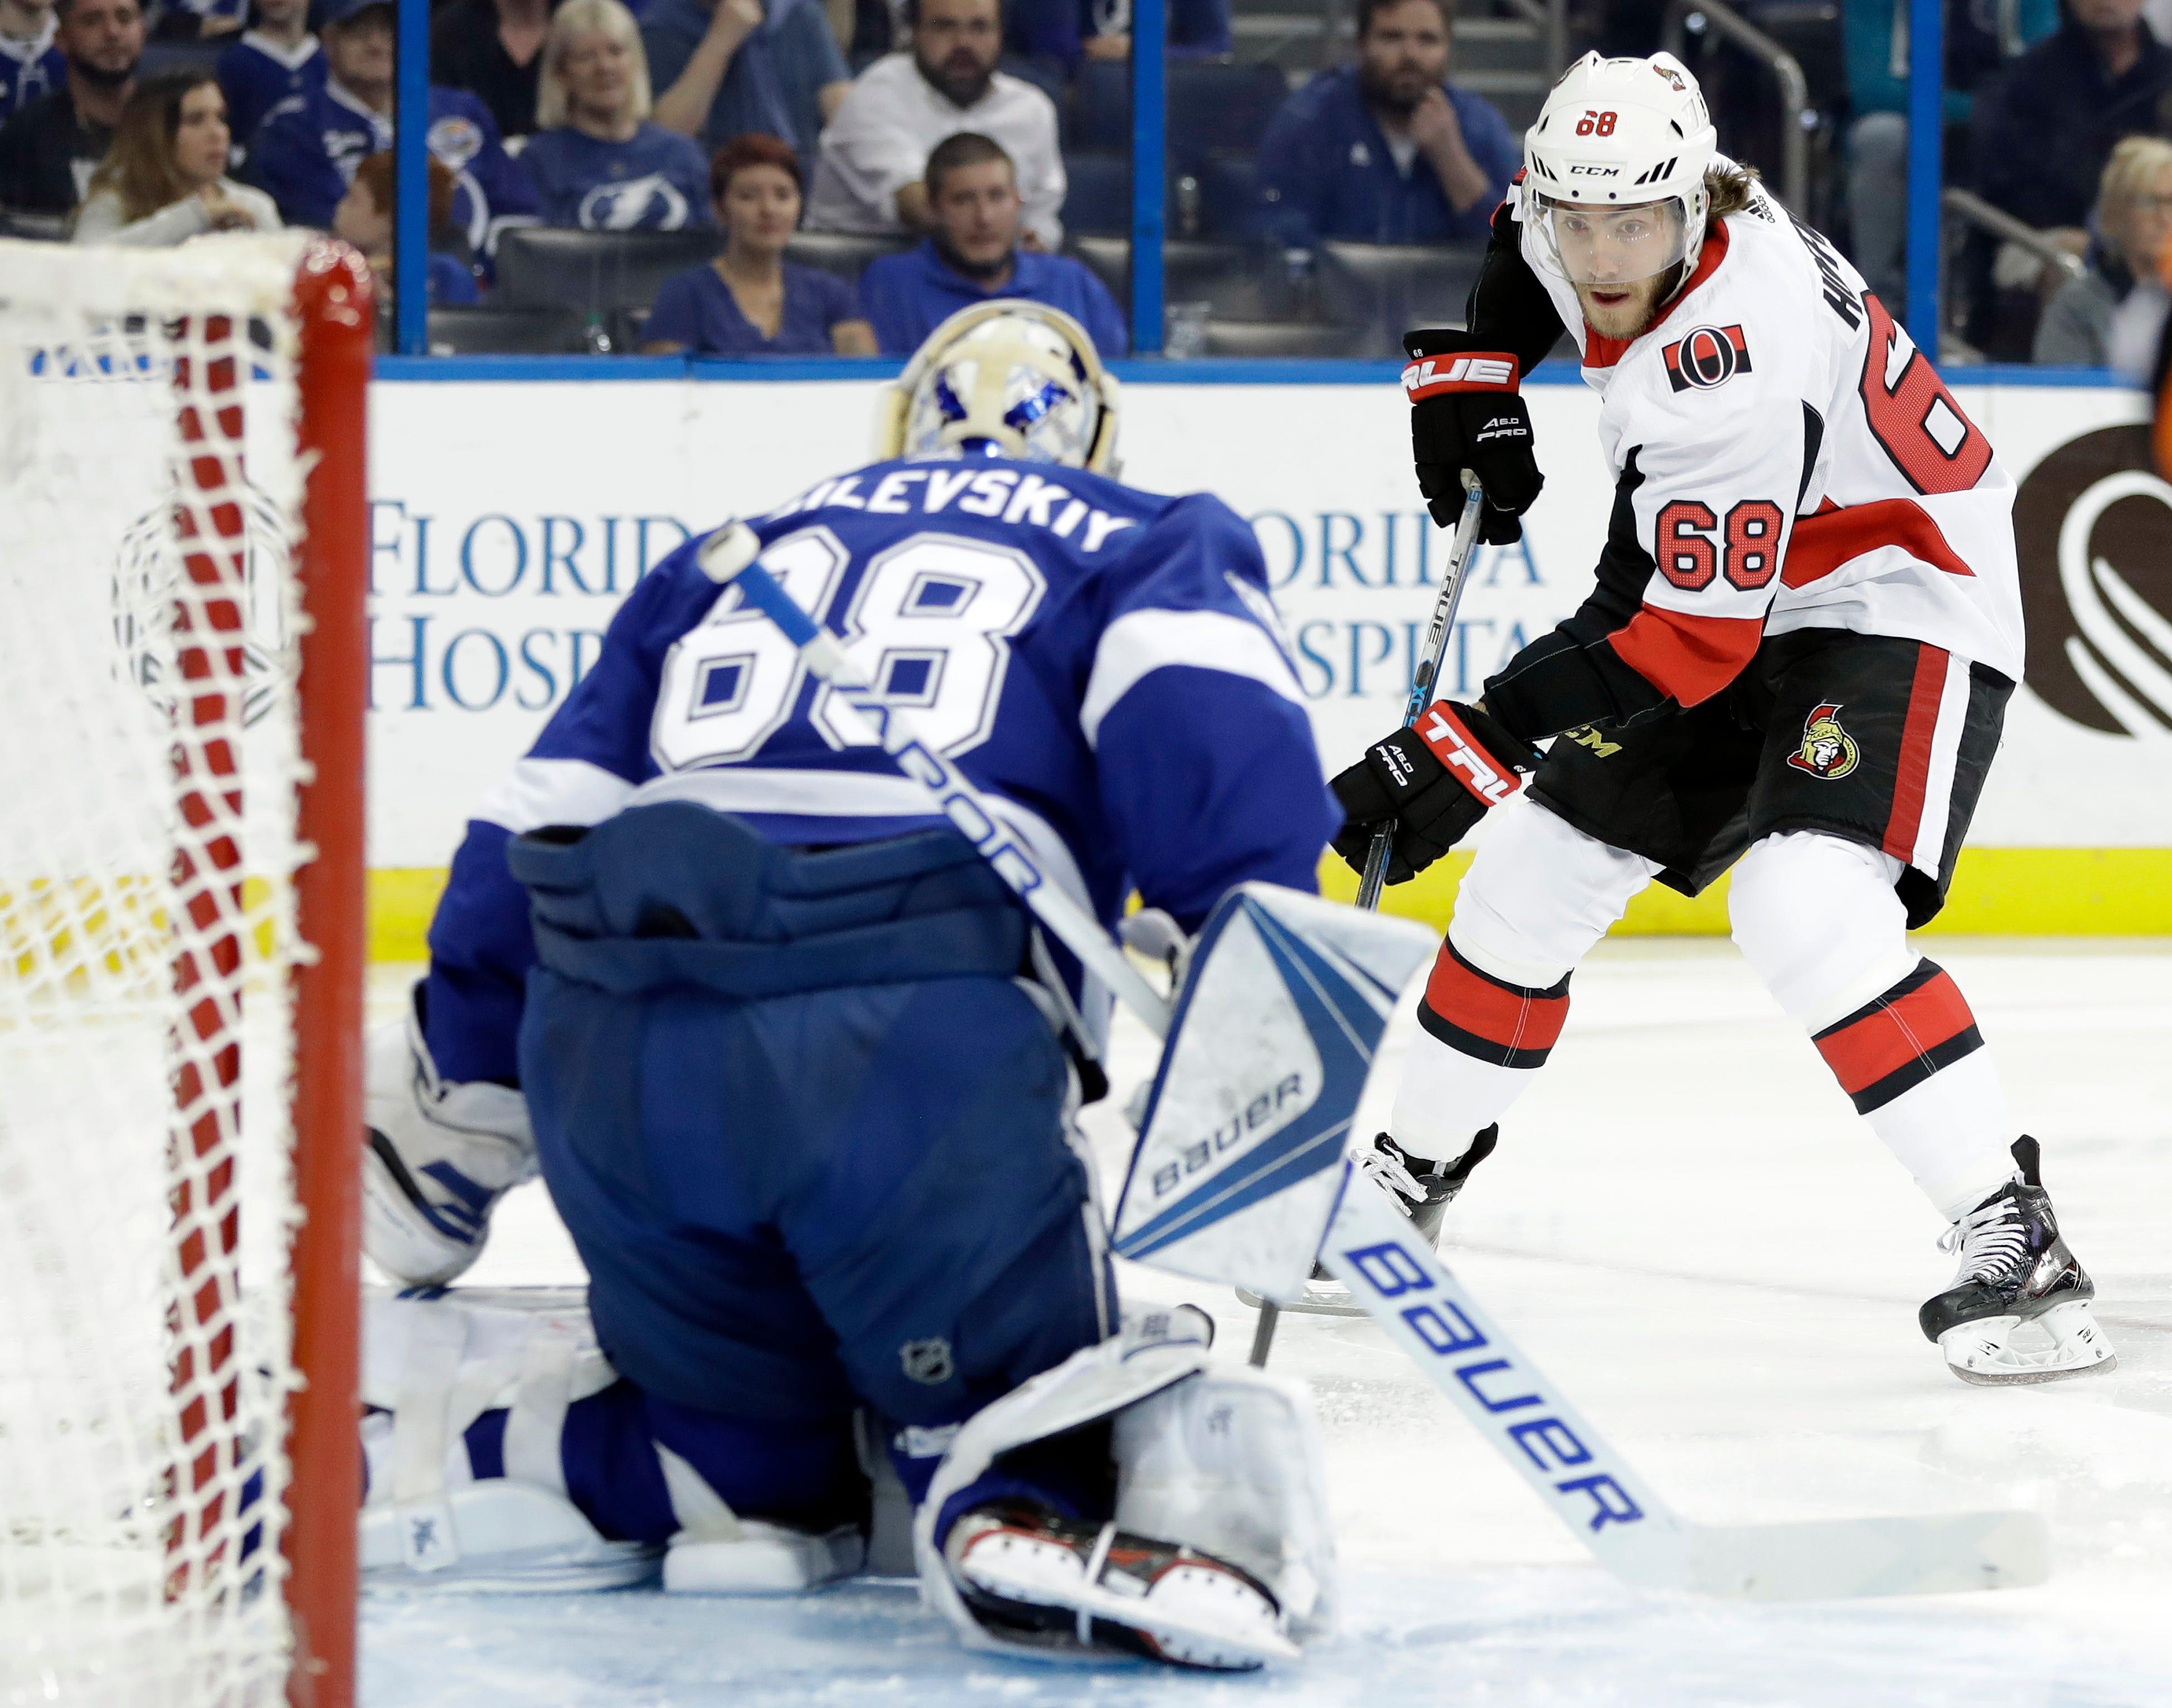 Point, Stamkos score in shootout as Lightning beat Senators